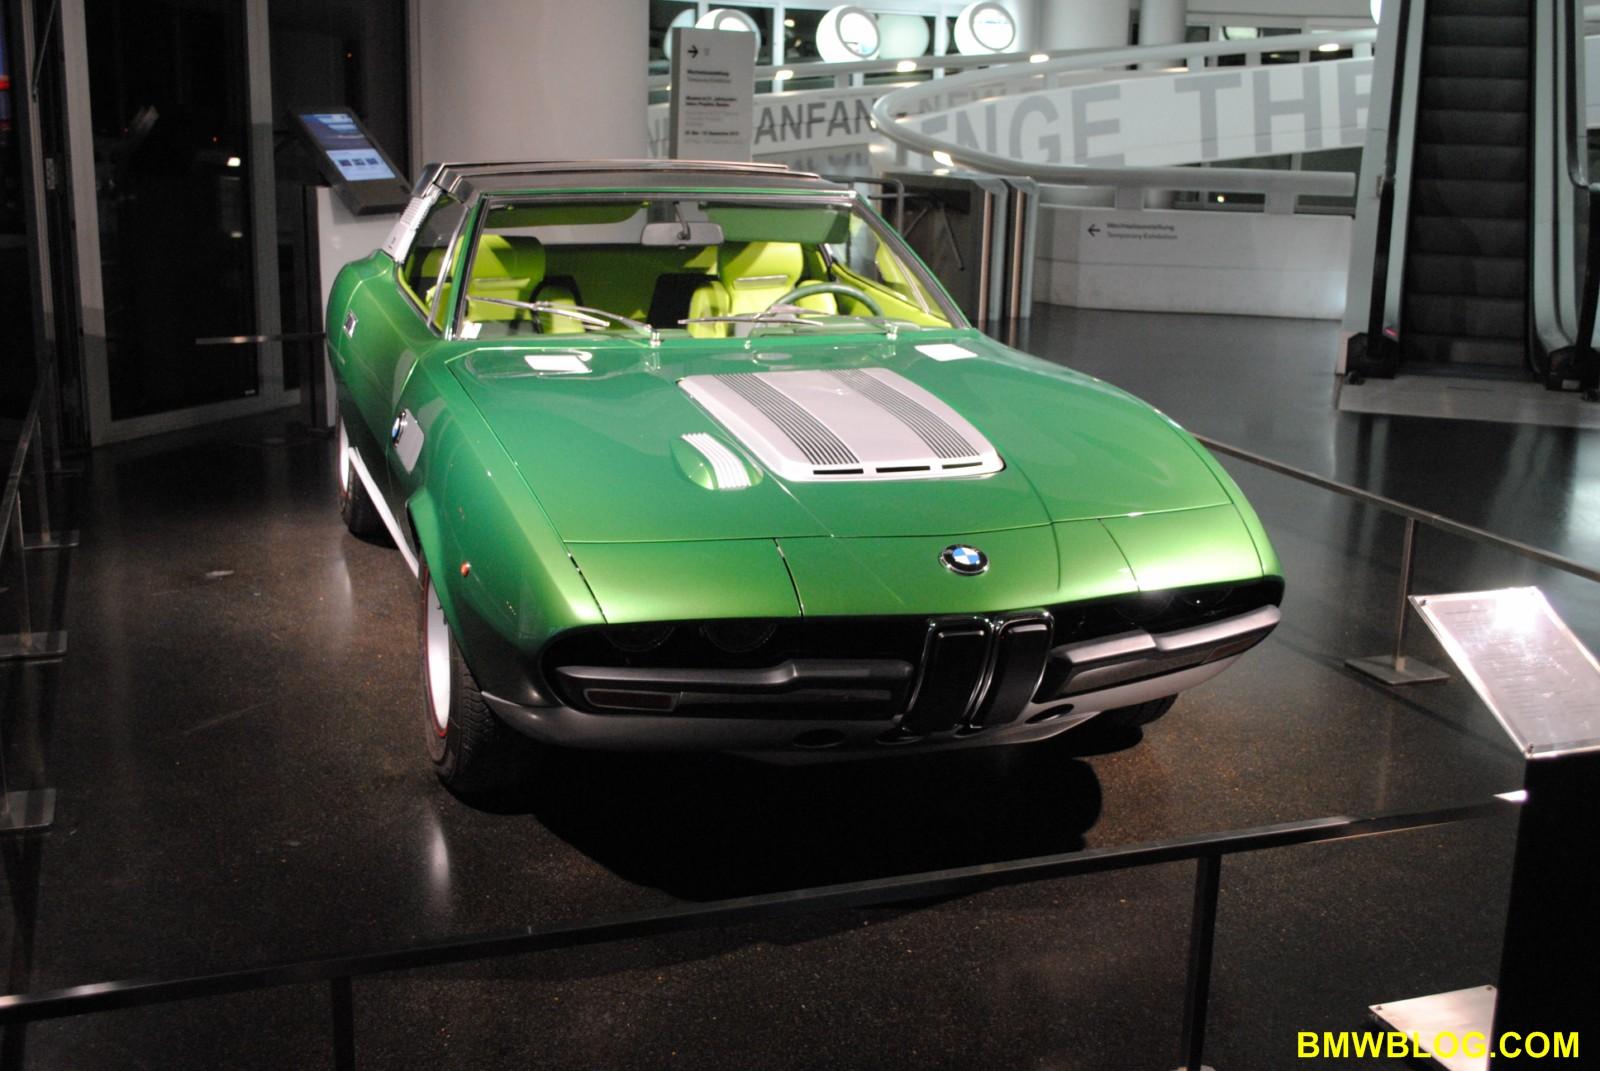 BMW 2800 green